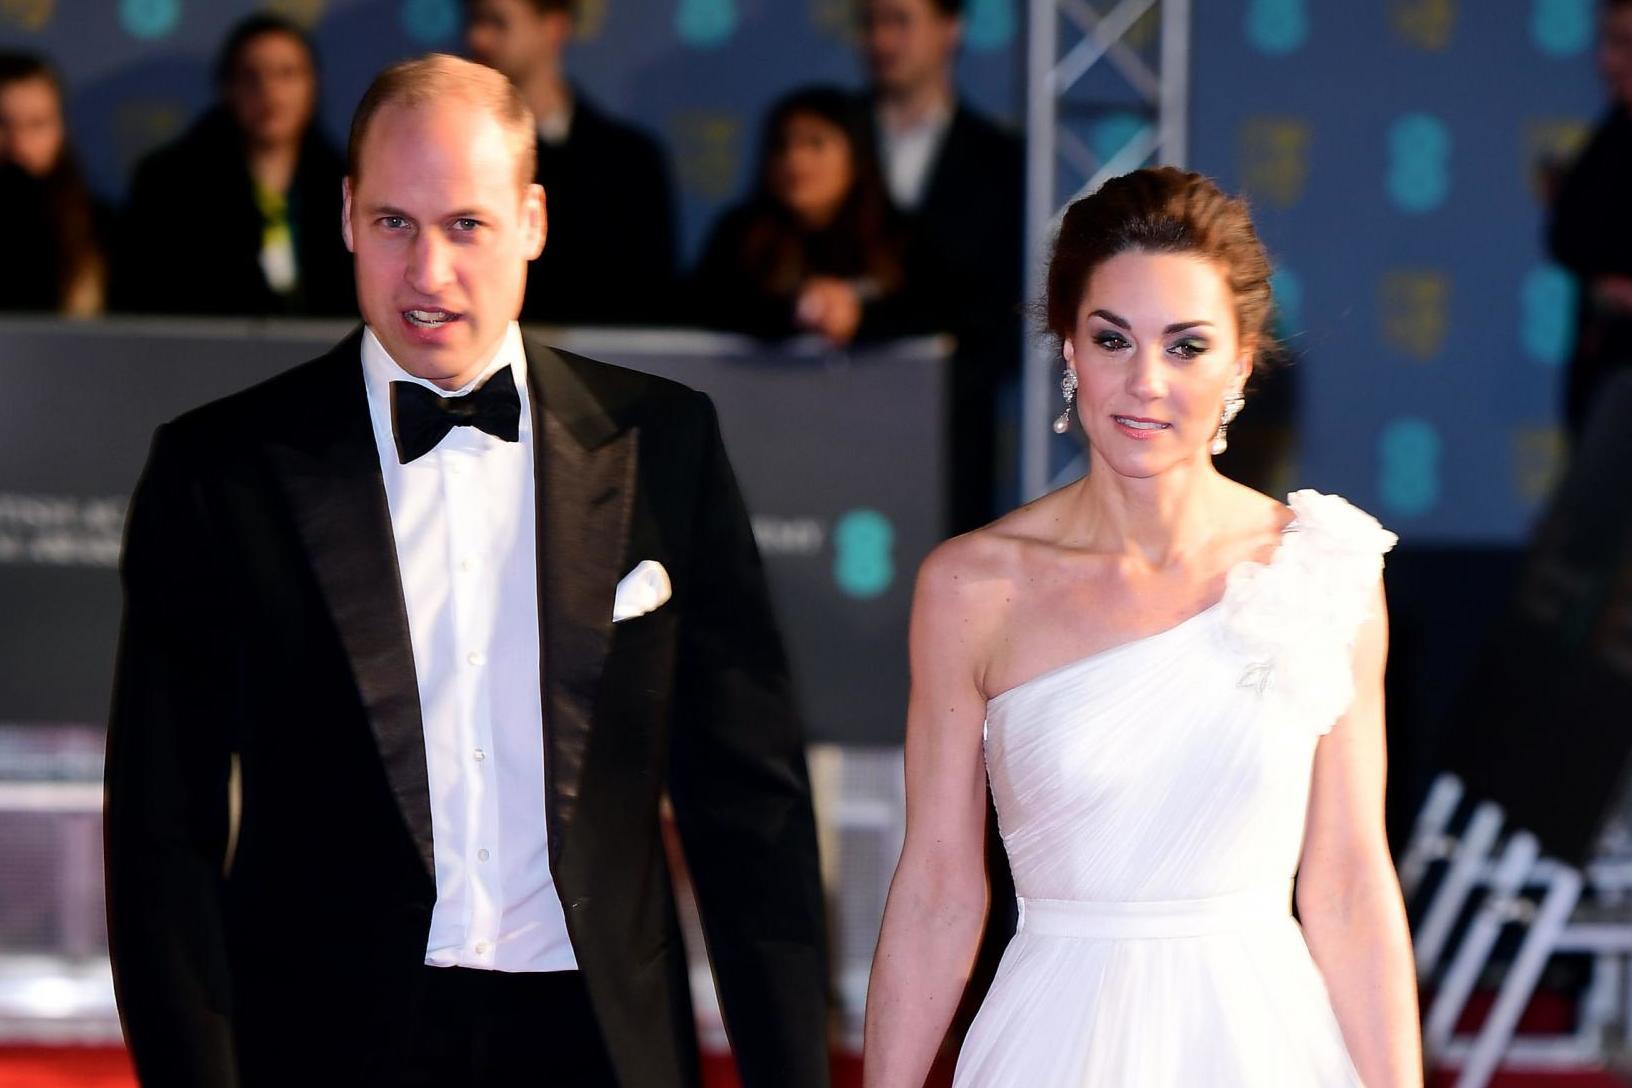 On Kate Middleton